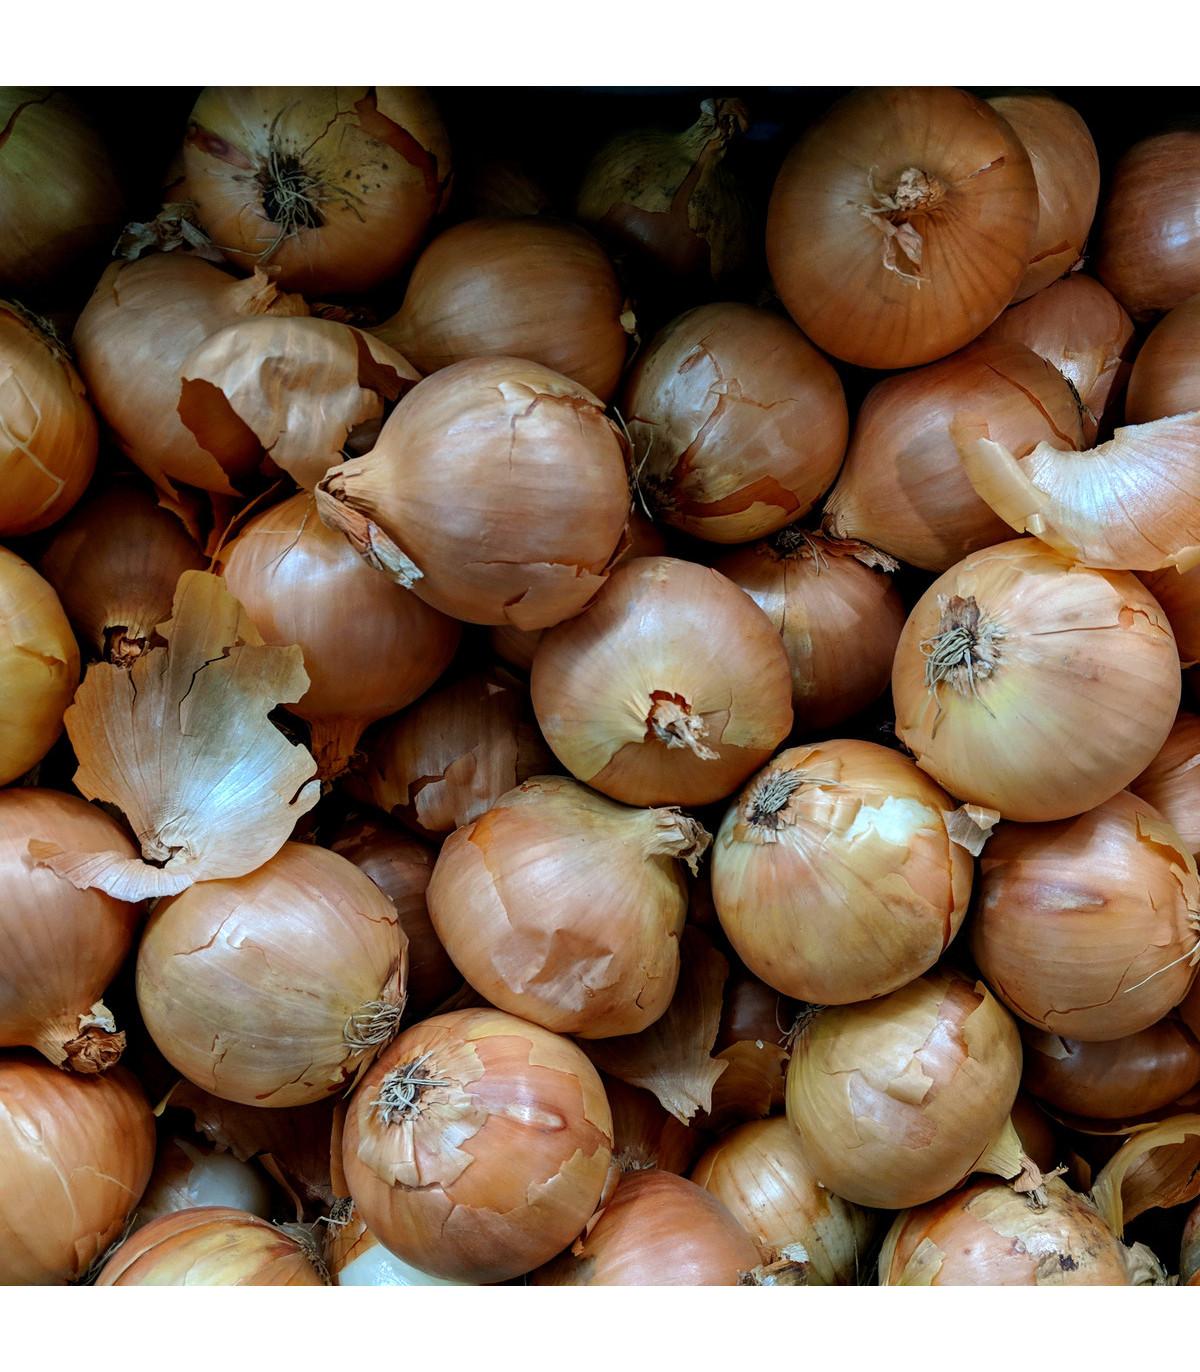 Cibule jarní bílá - semena Cibule - 250 ks